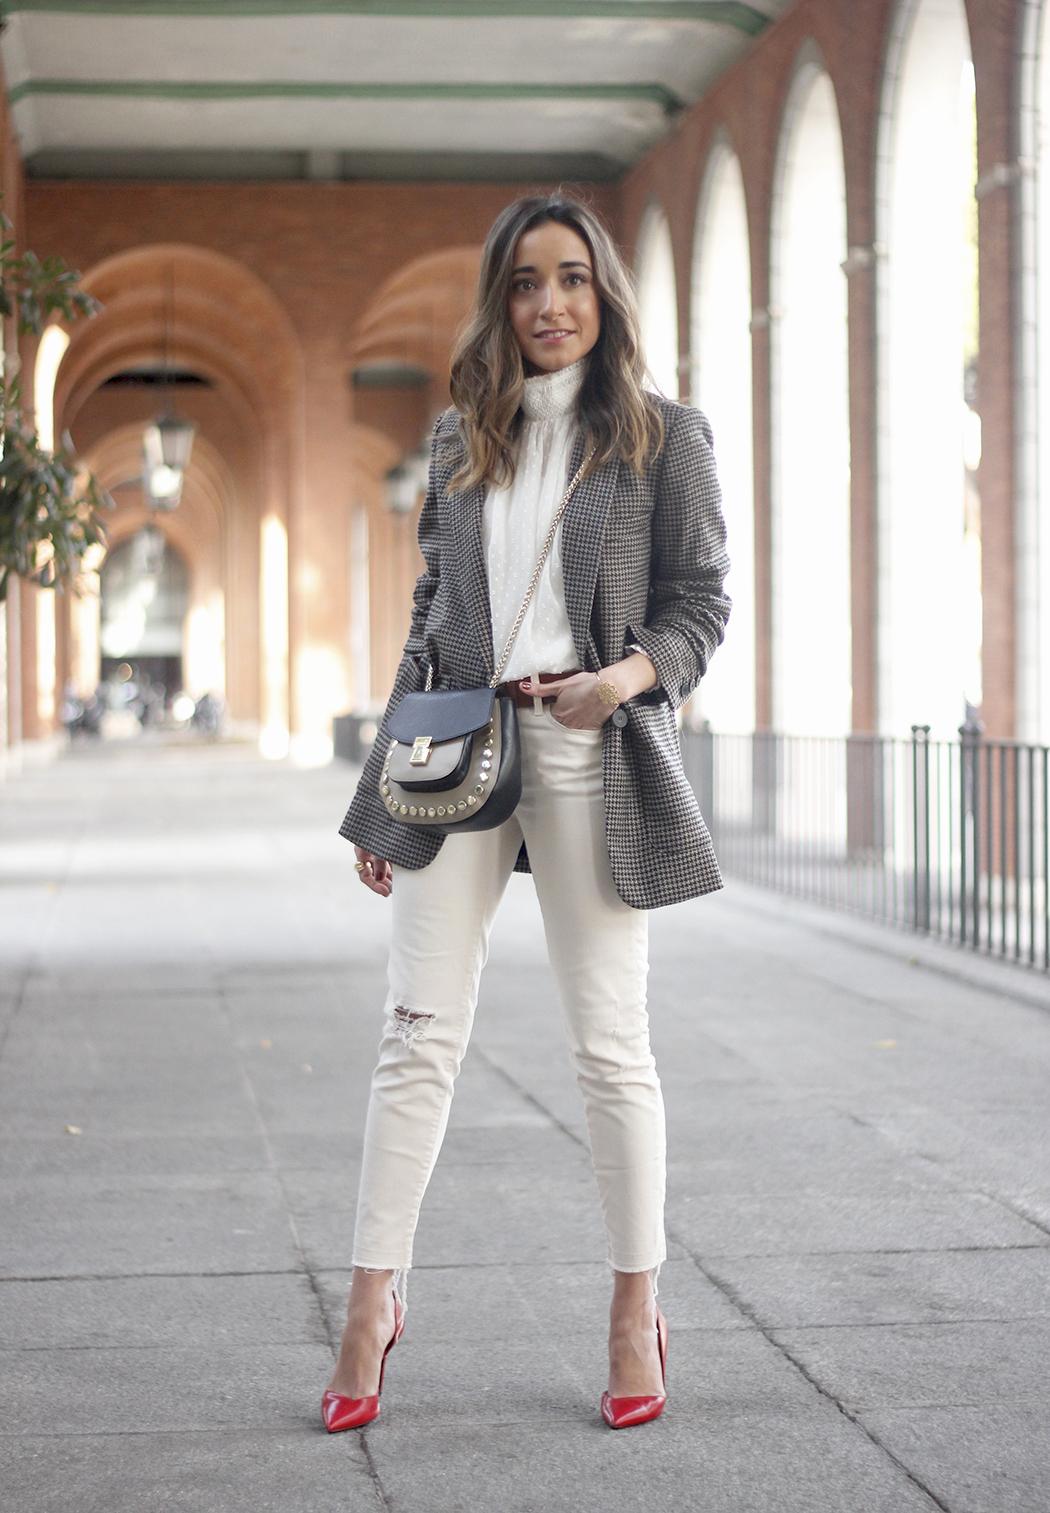 Plumeti blouse houndstooth blazer white jeans outfit style streetstyle21